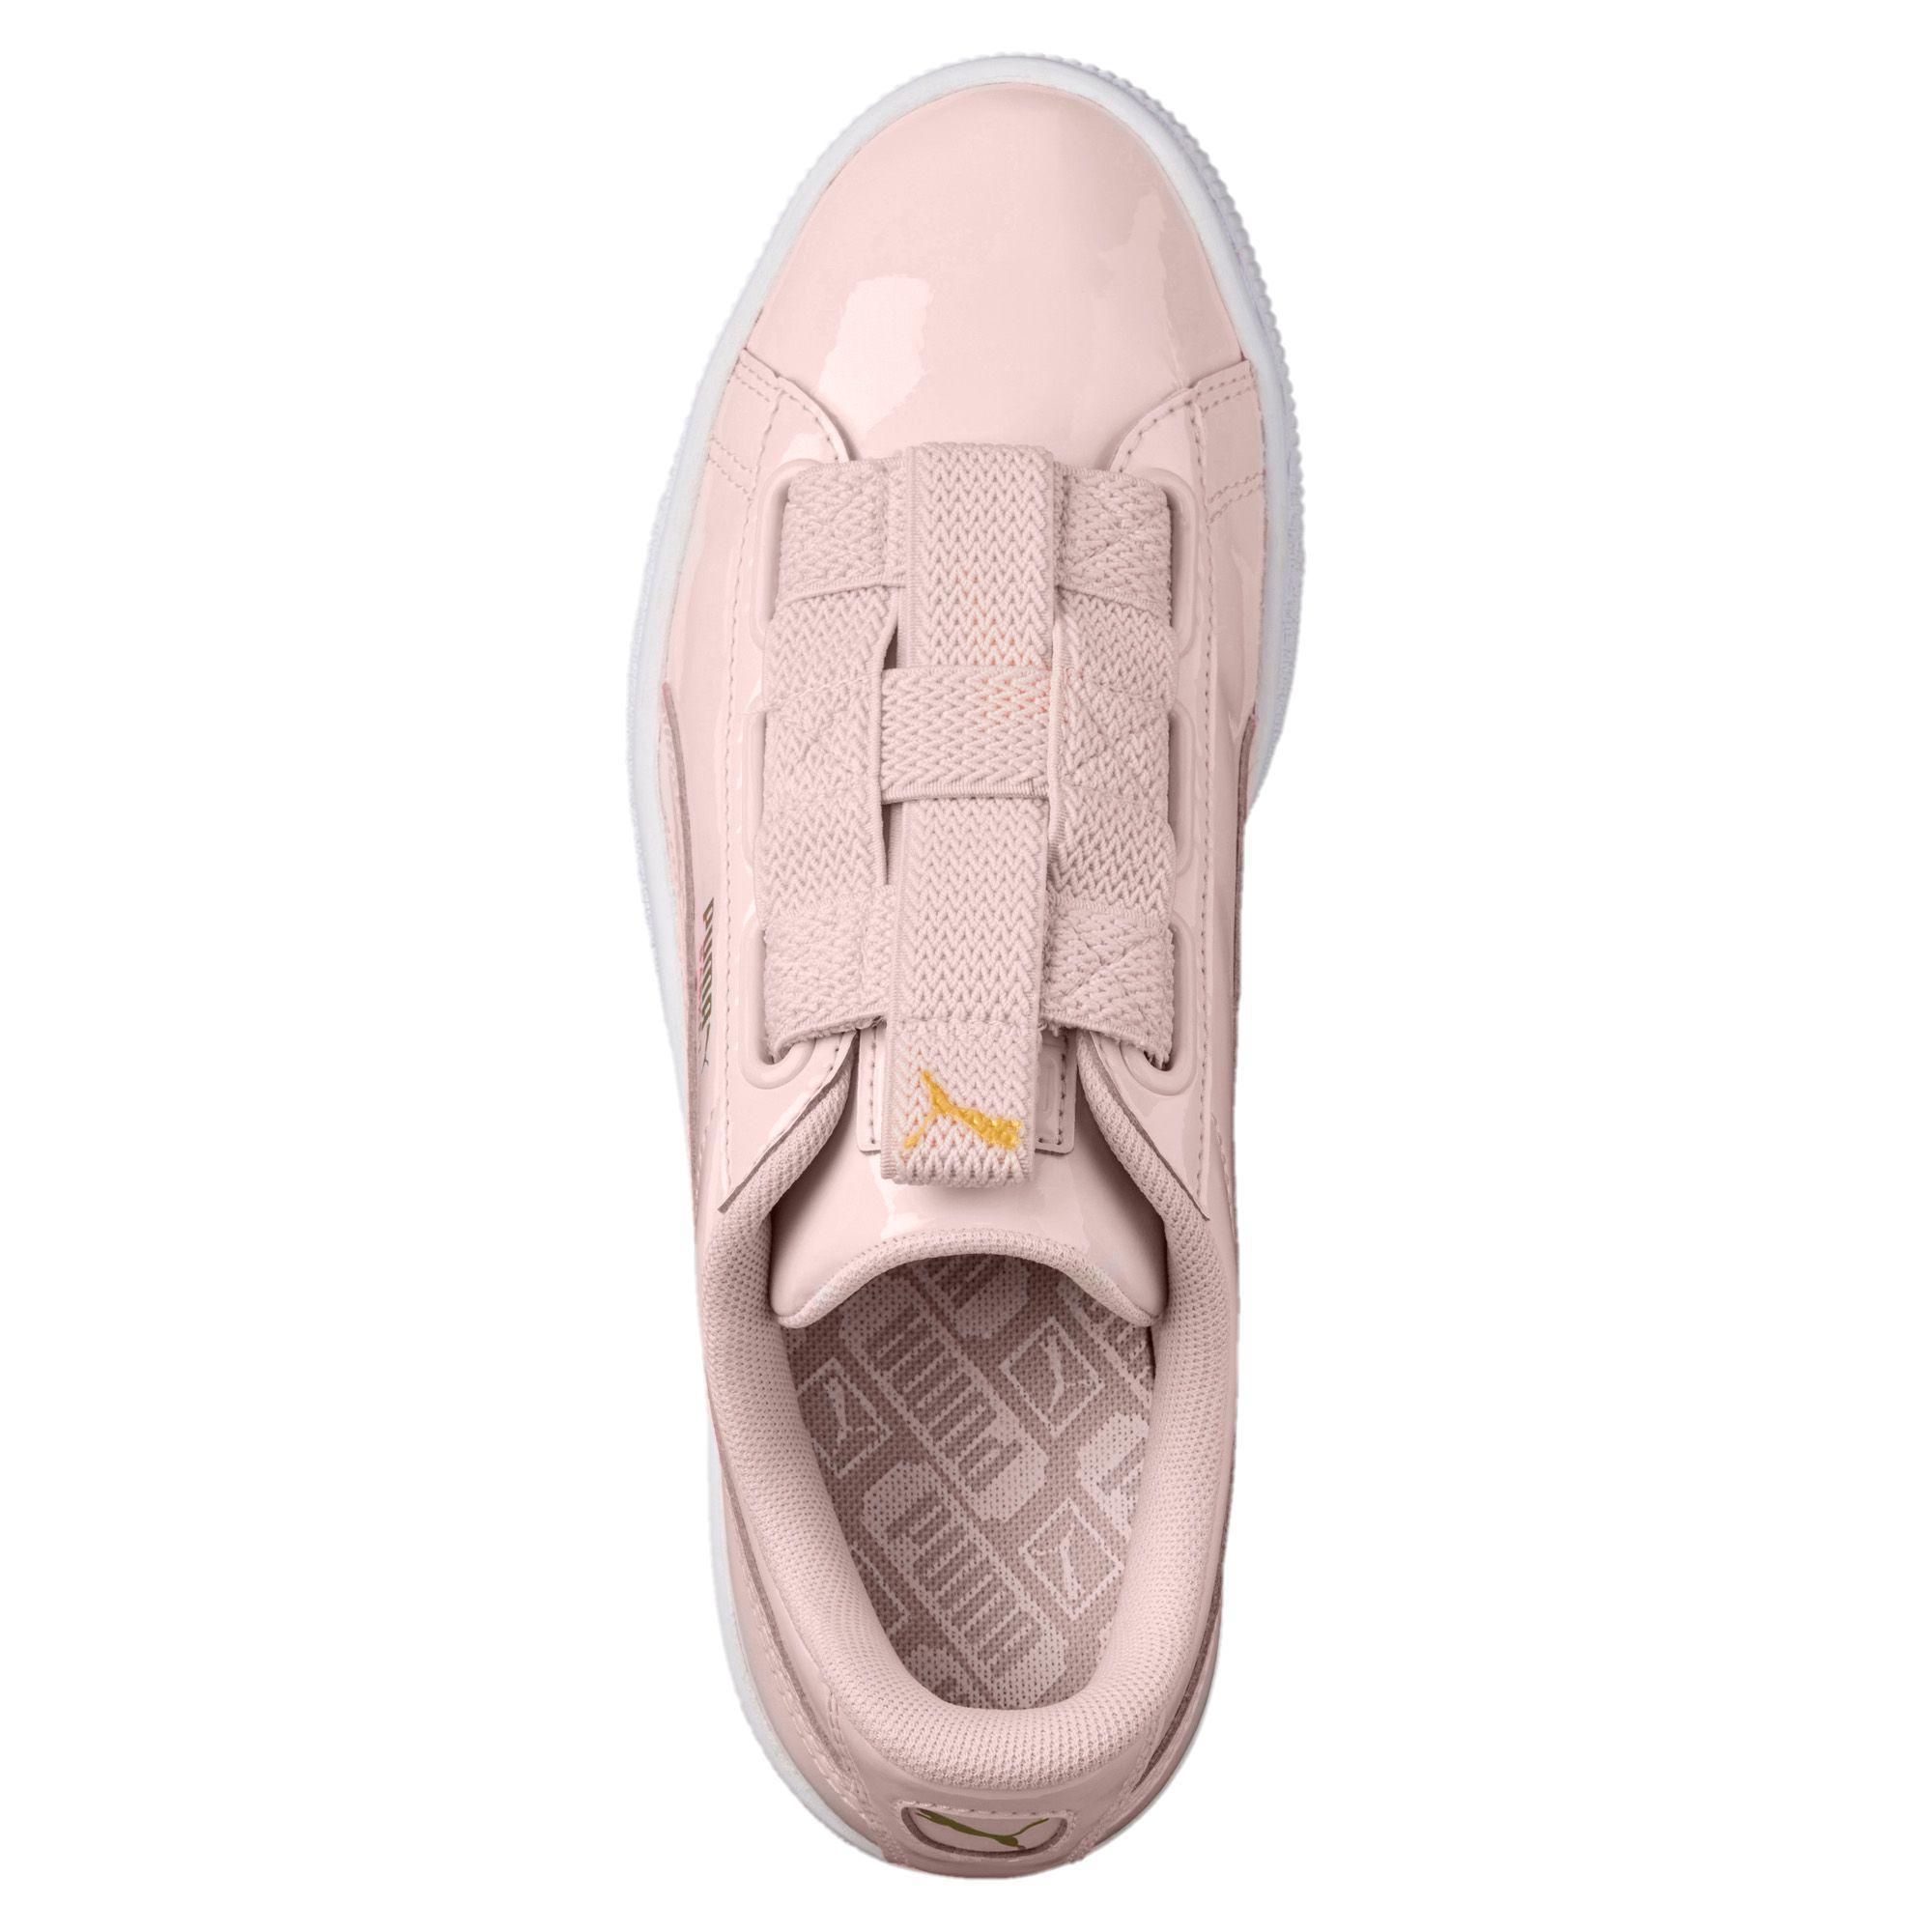 0c564f7a6b PUMA Pink Basket Maze Women's Sneakers